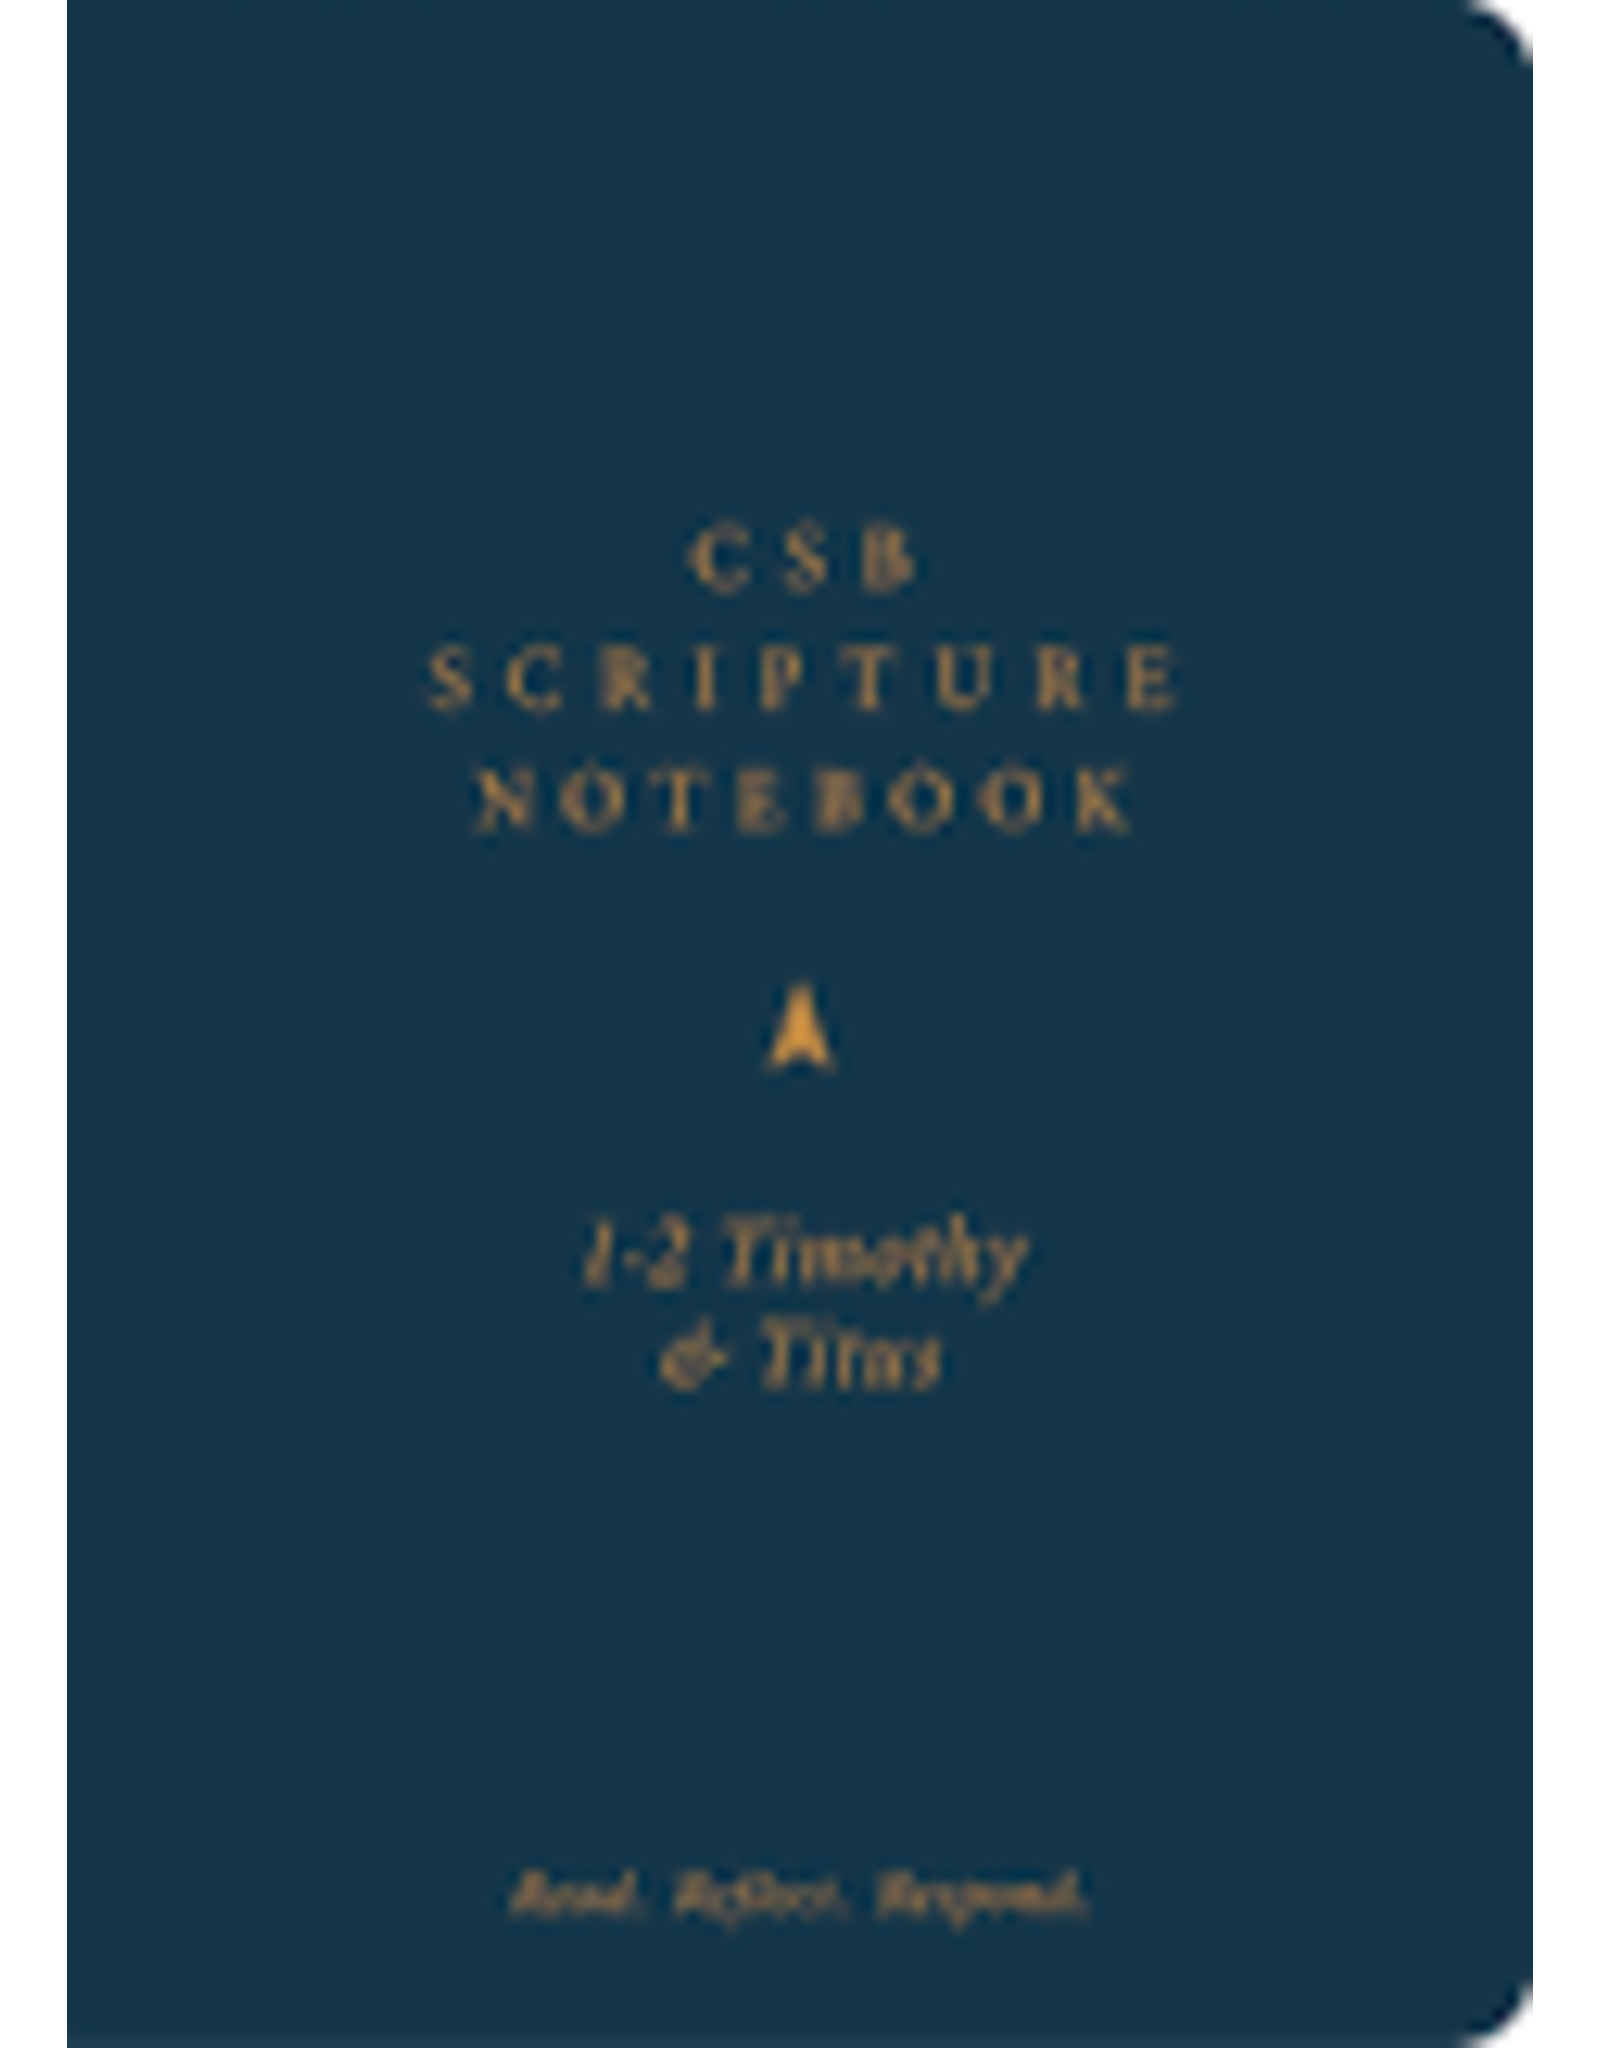 Holman CSB Scripture Notebook - 1-2Timothy & Titus